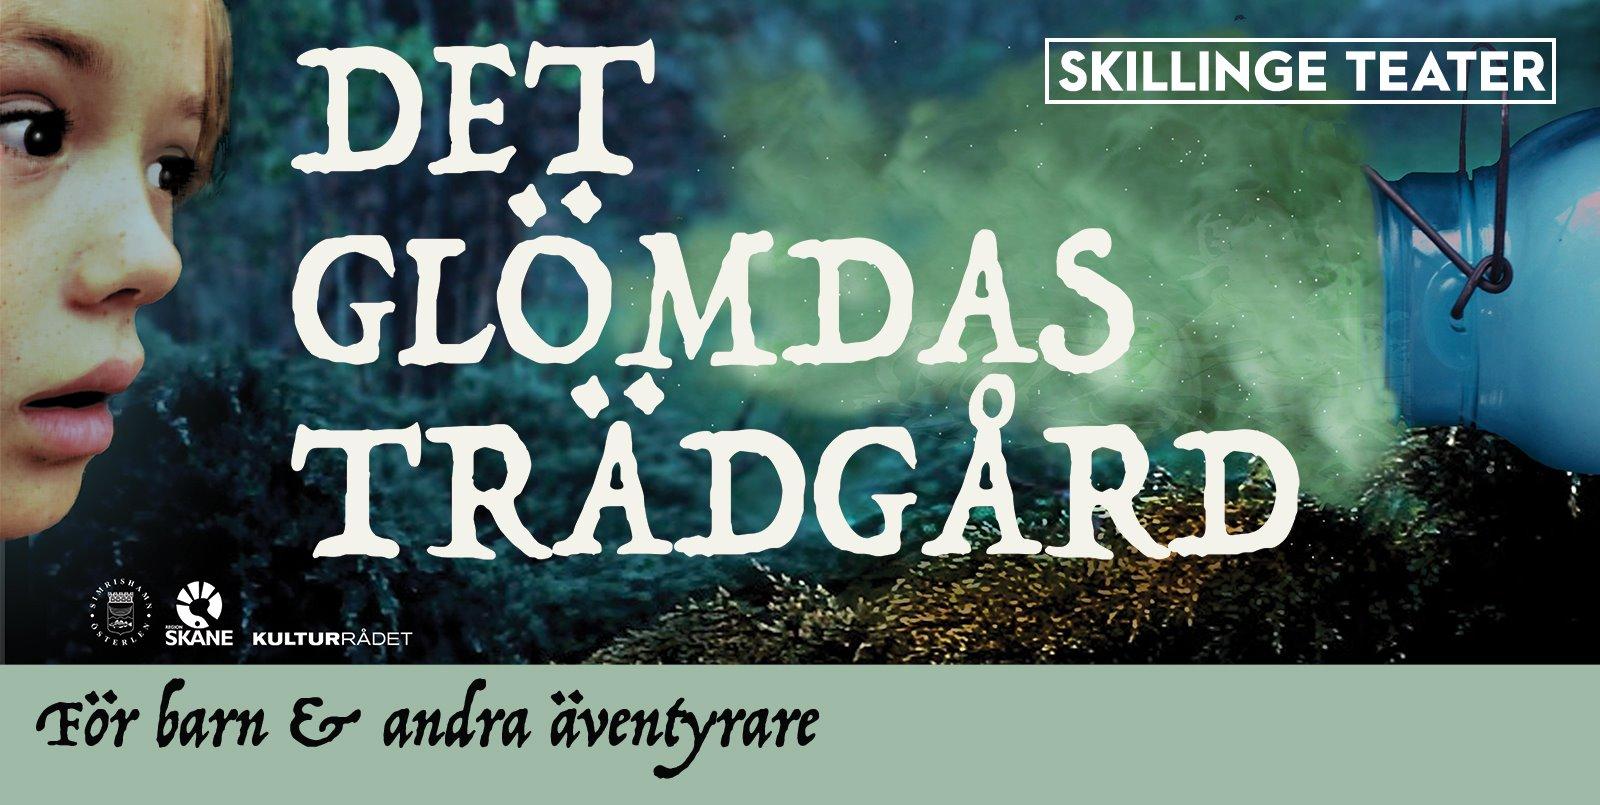 Det Glomdas Tradgard Skillinge Teater österlen.se